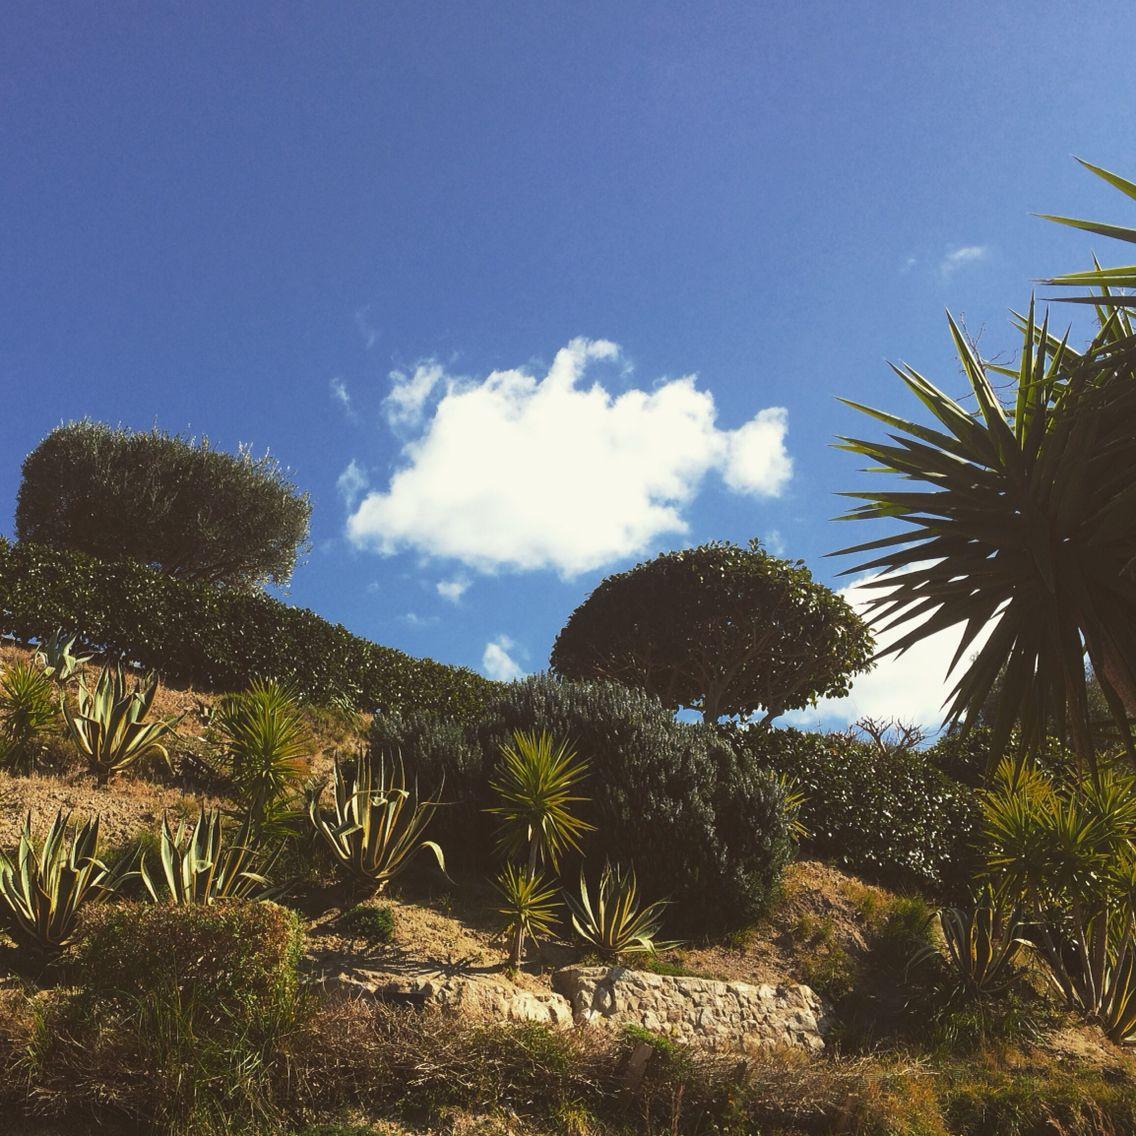 My mediterranean garden.. Do you like it?